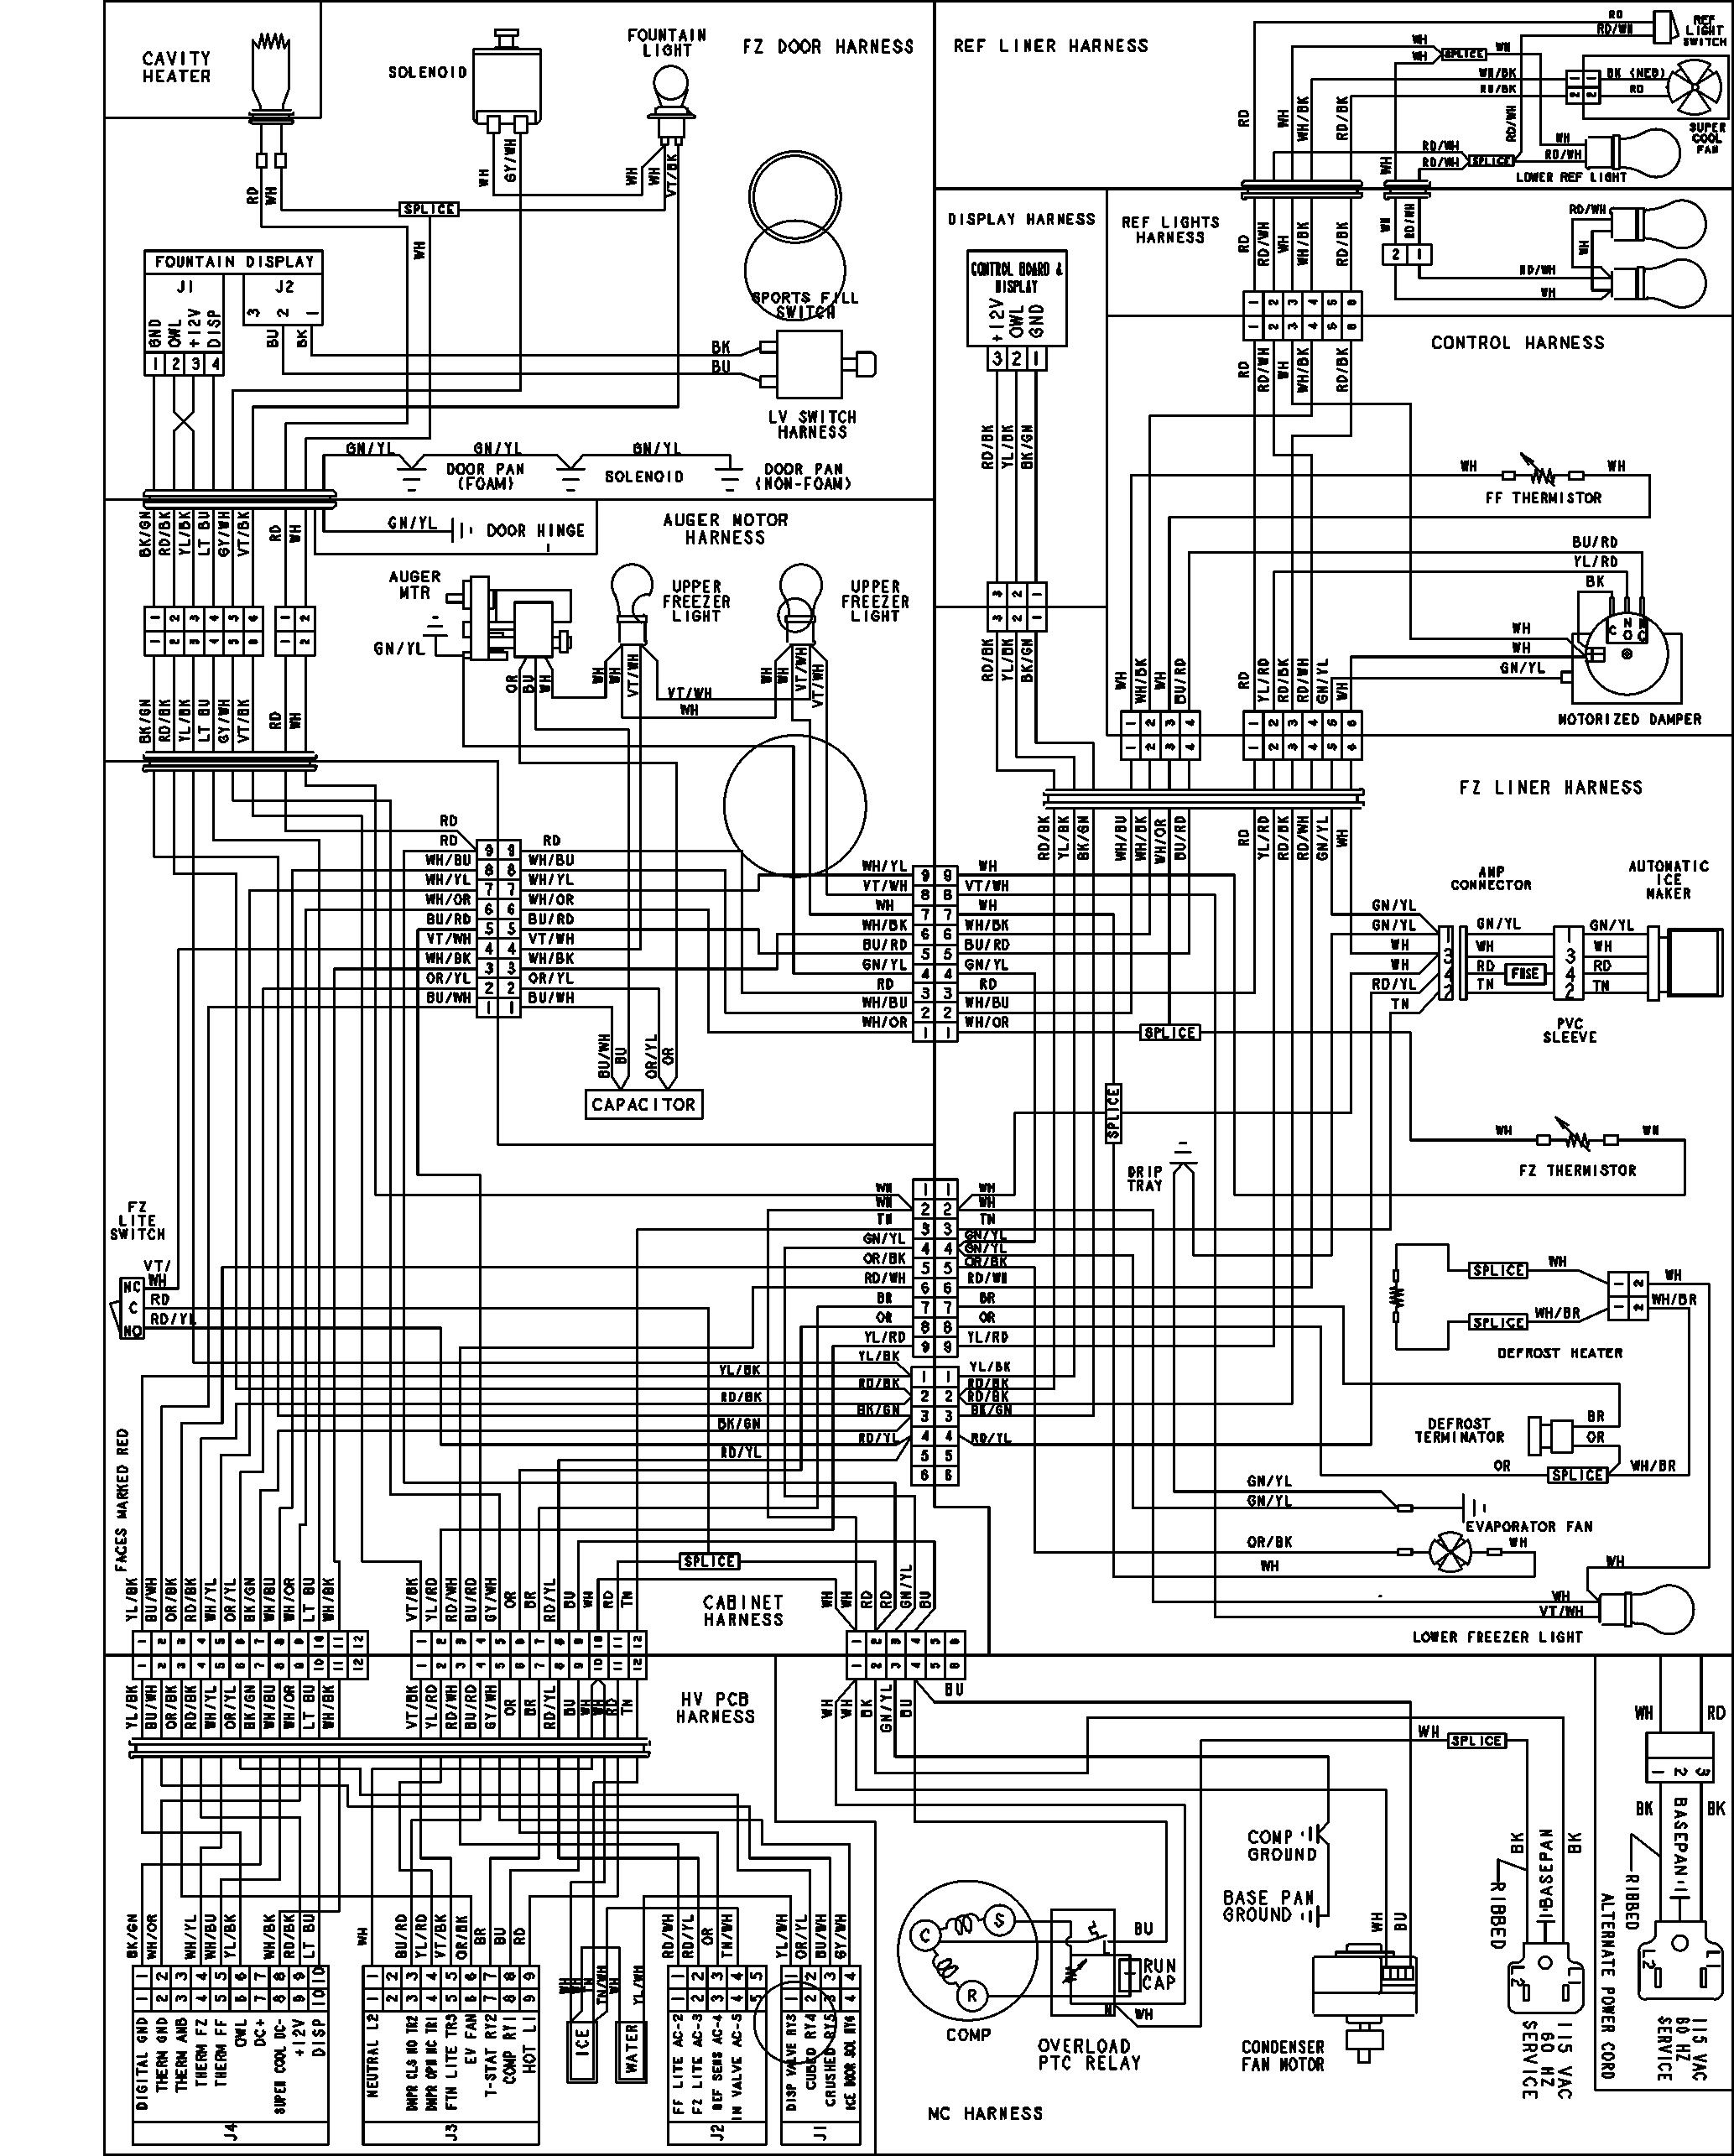 Ge Refrigerator Schematic Electrical - 2000 Mitsubishi Eclipse Wiring  Harness - piooner-radios.wiringdol.jeanjaures37.fr | Ge Refrigerator Schematic Electrical |  | Wiring Diagram Resource